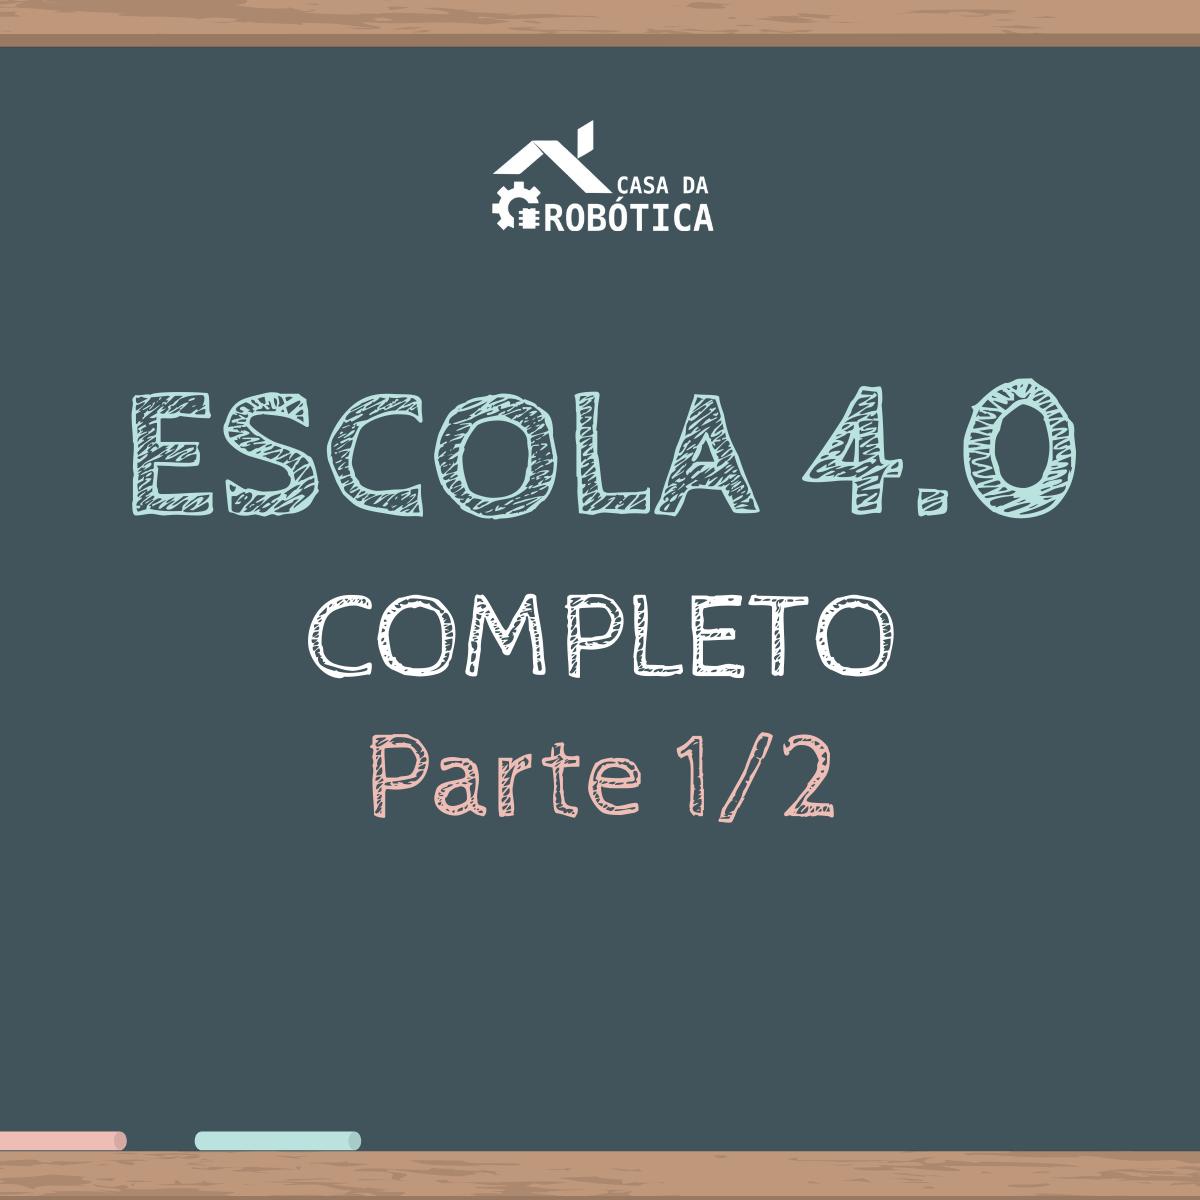 KIT - Escola 4.0 - Material para as atividades - Parte 01 de 02